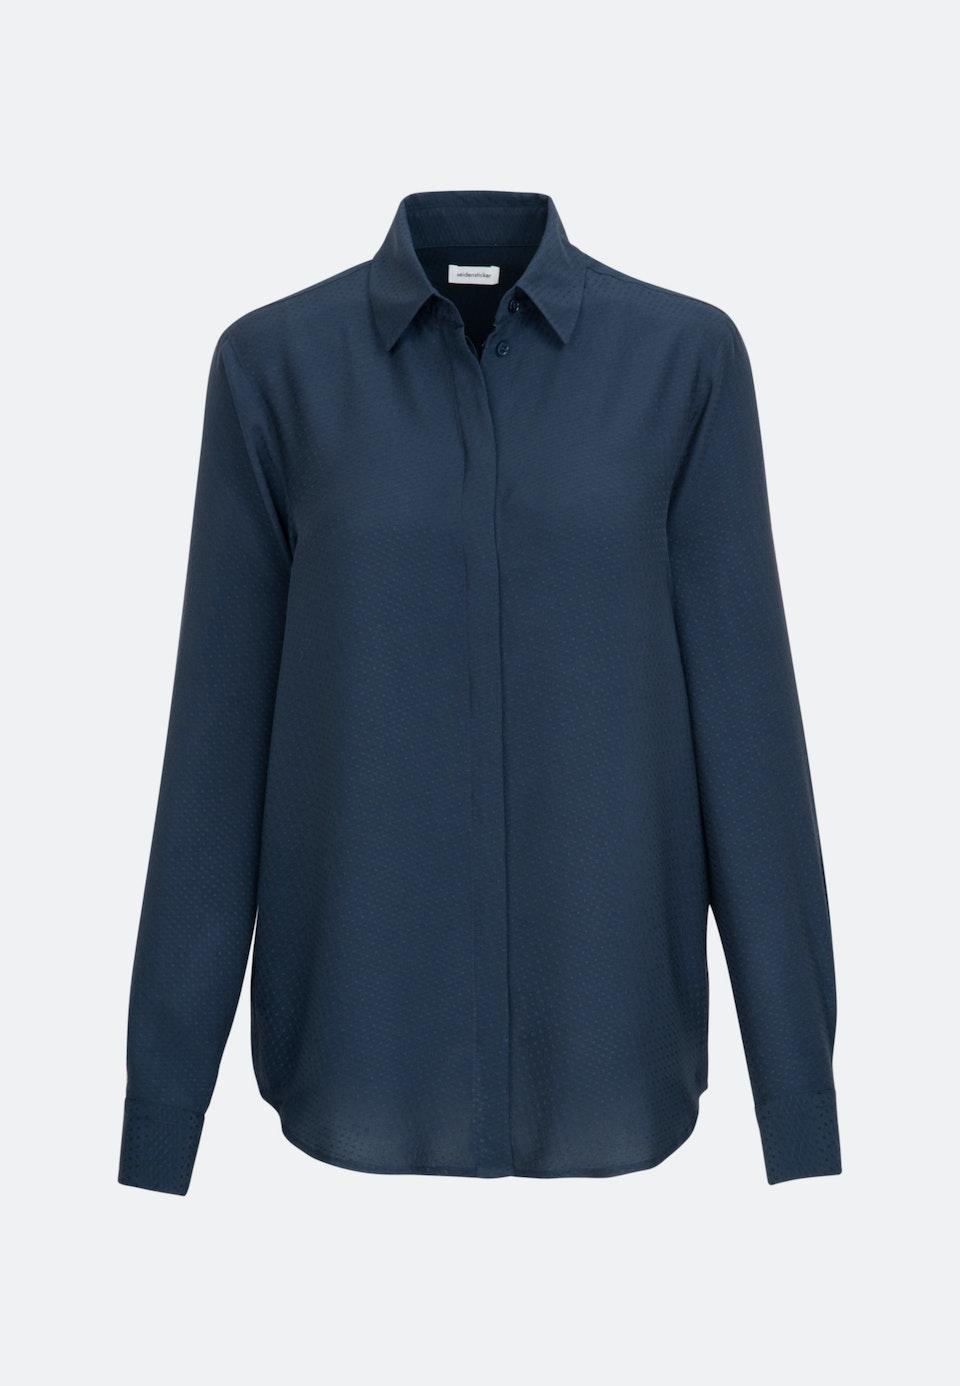 Jacquard Shirt Blouse made of 100% Viscose in Dark blue |  Seidensticker Onlineshop